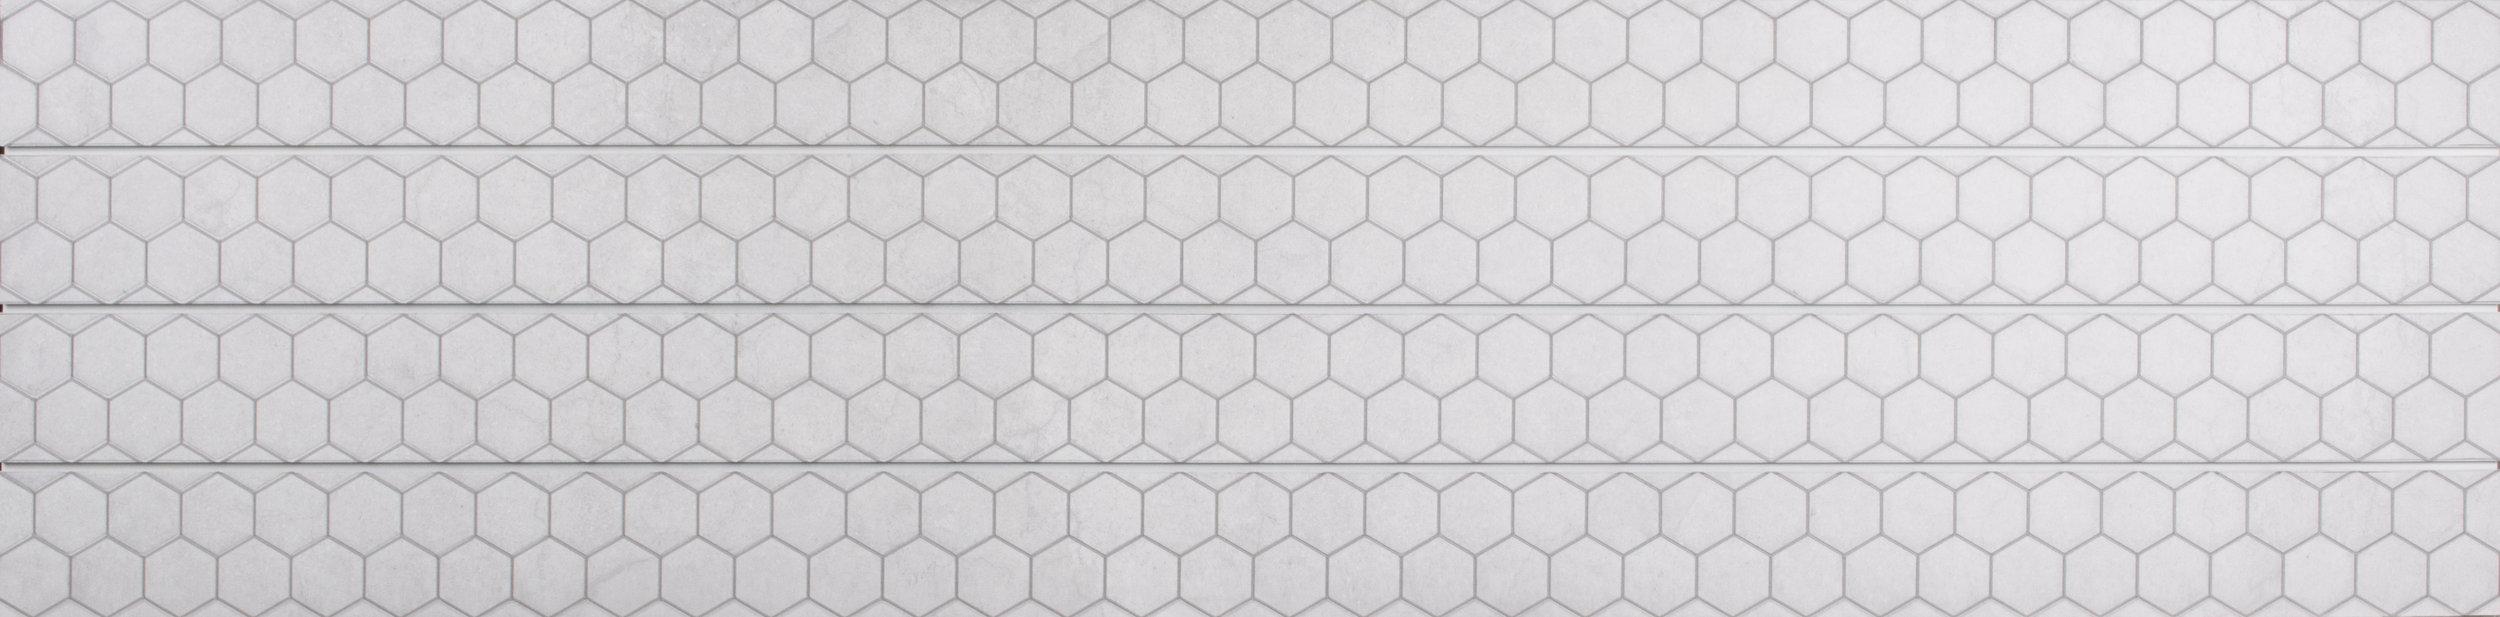 honeycomg lt grey.jpg